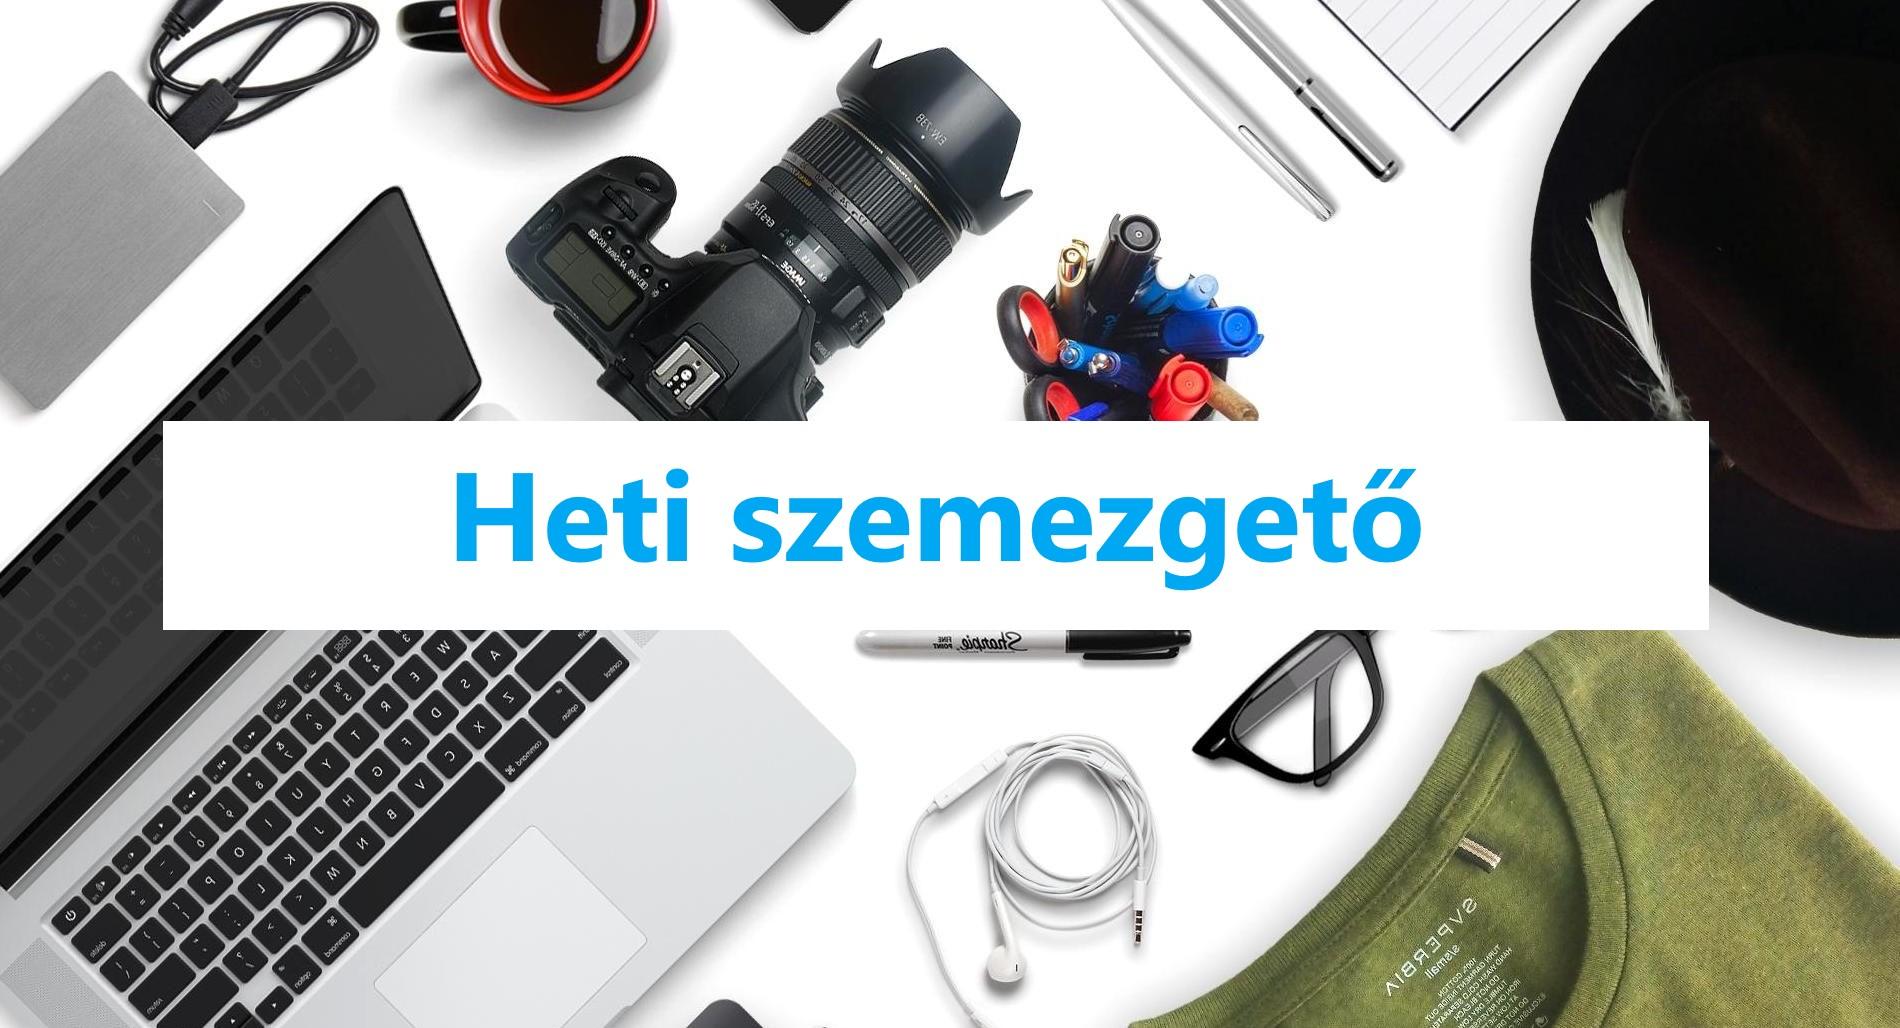 heti_szemezgeto_uj_1.jpg